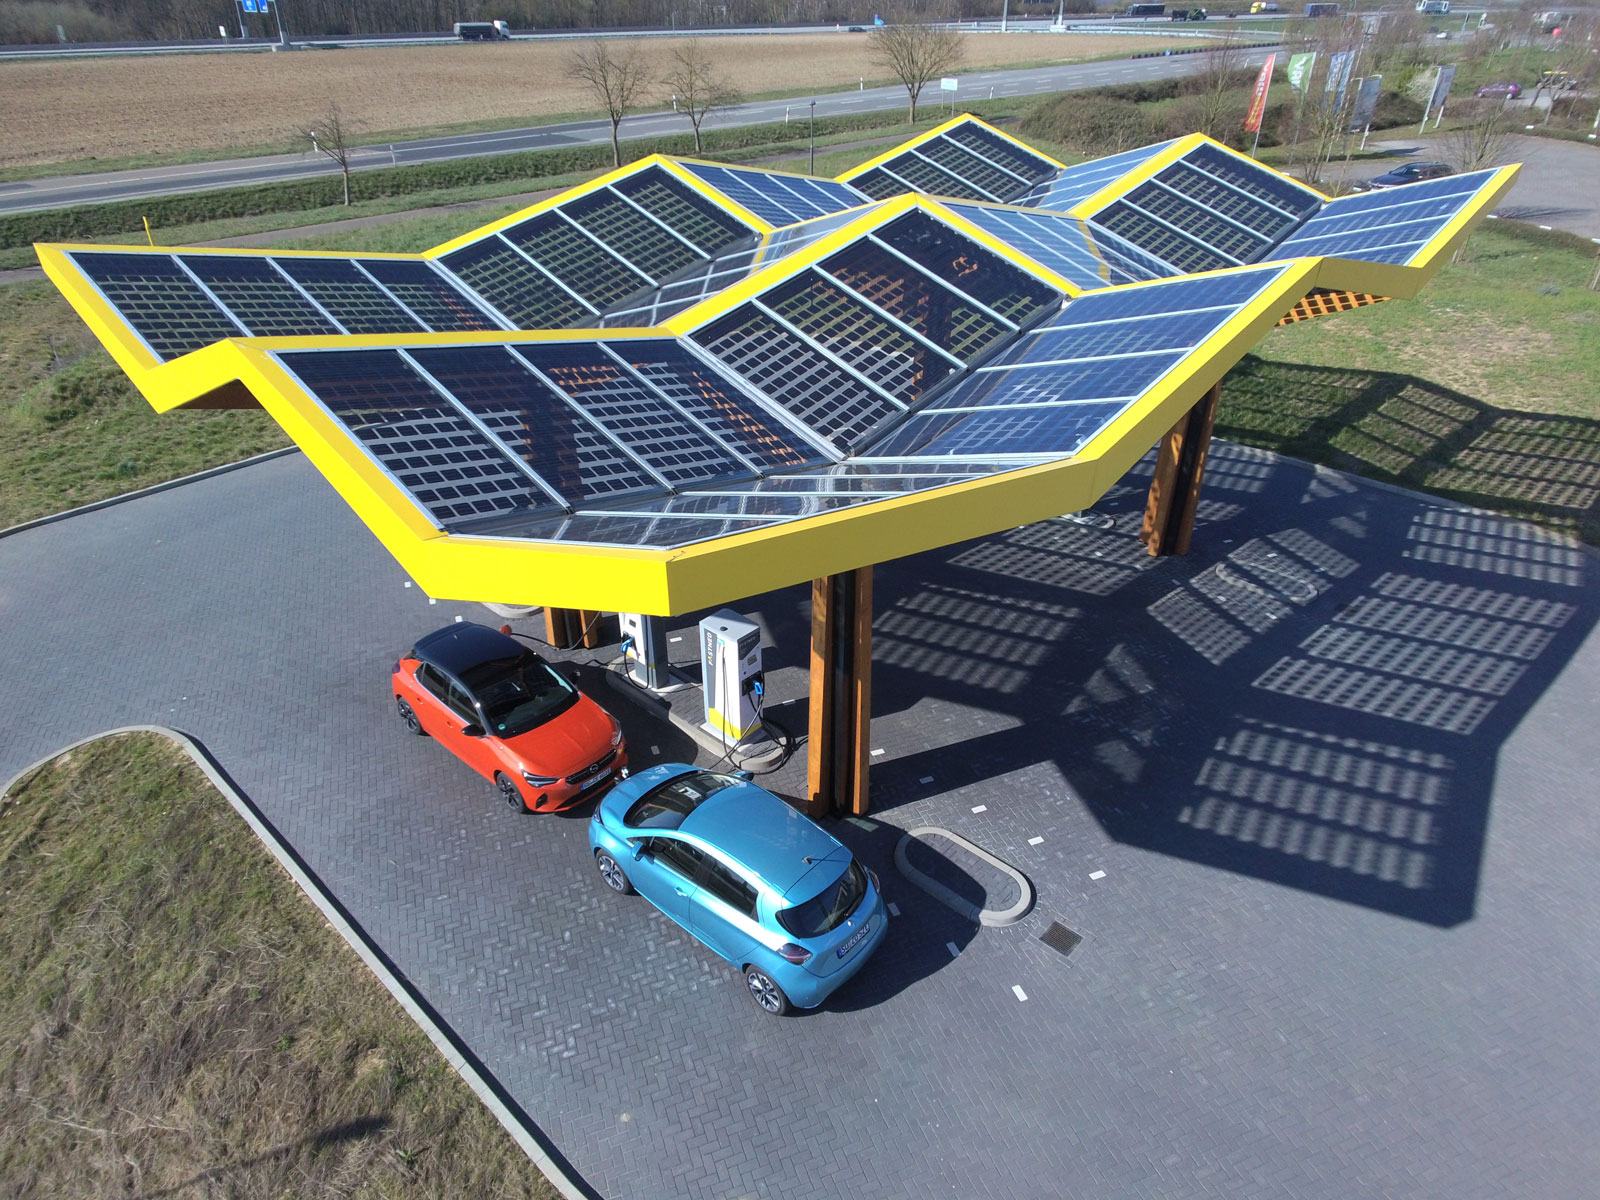 Charging-Radar-E-Auto-Boom-wird-zum-Problem